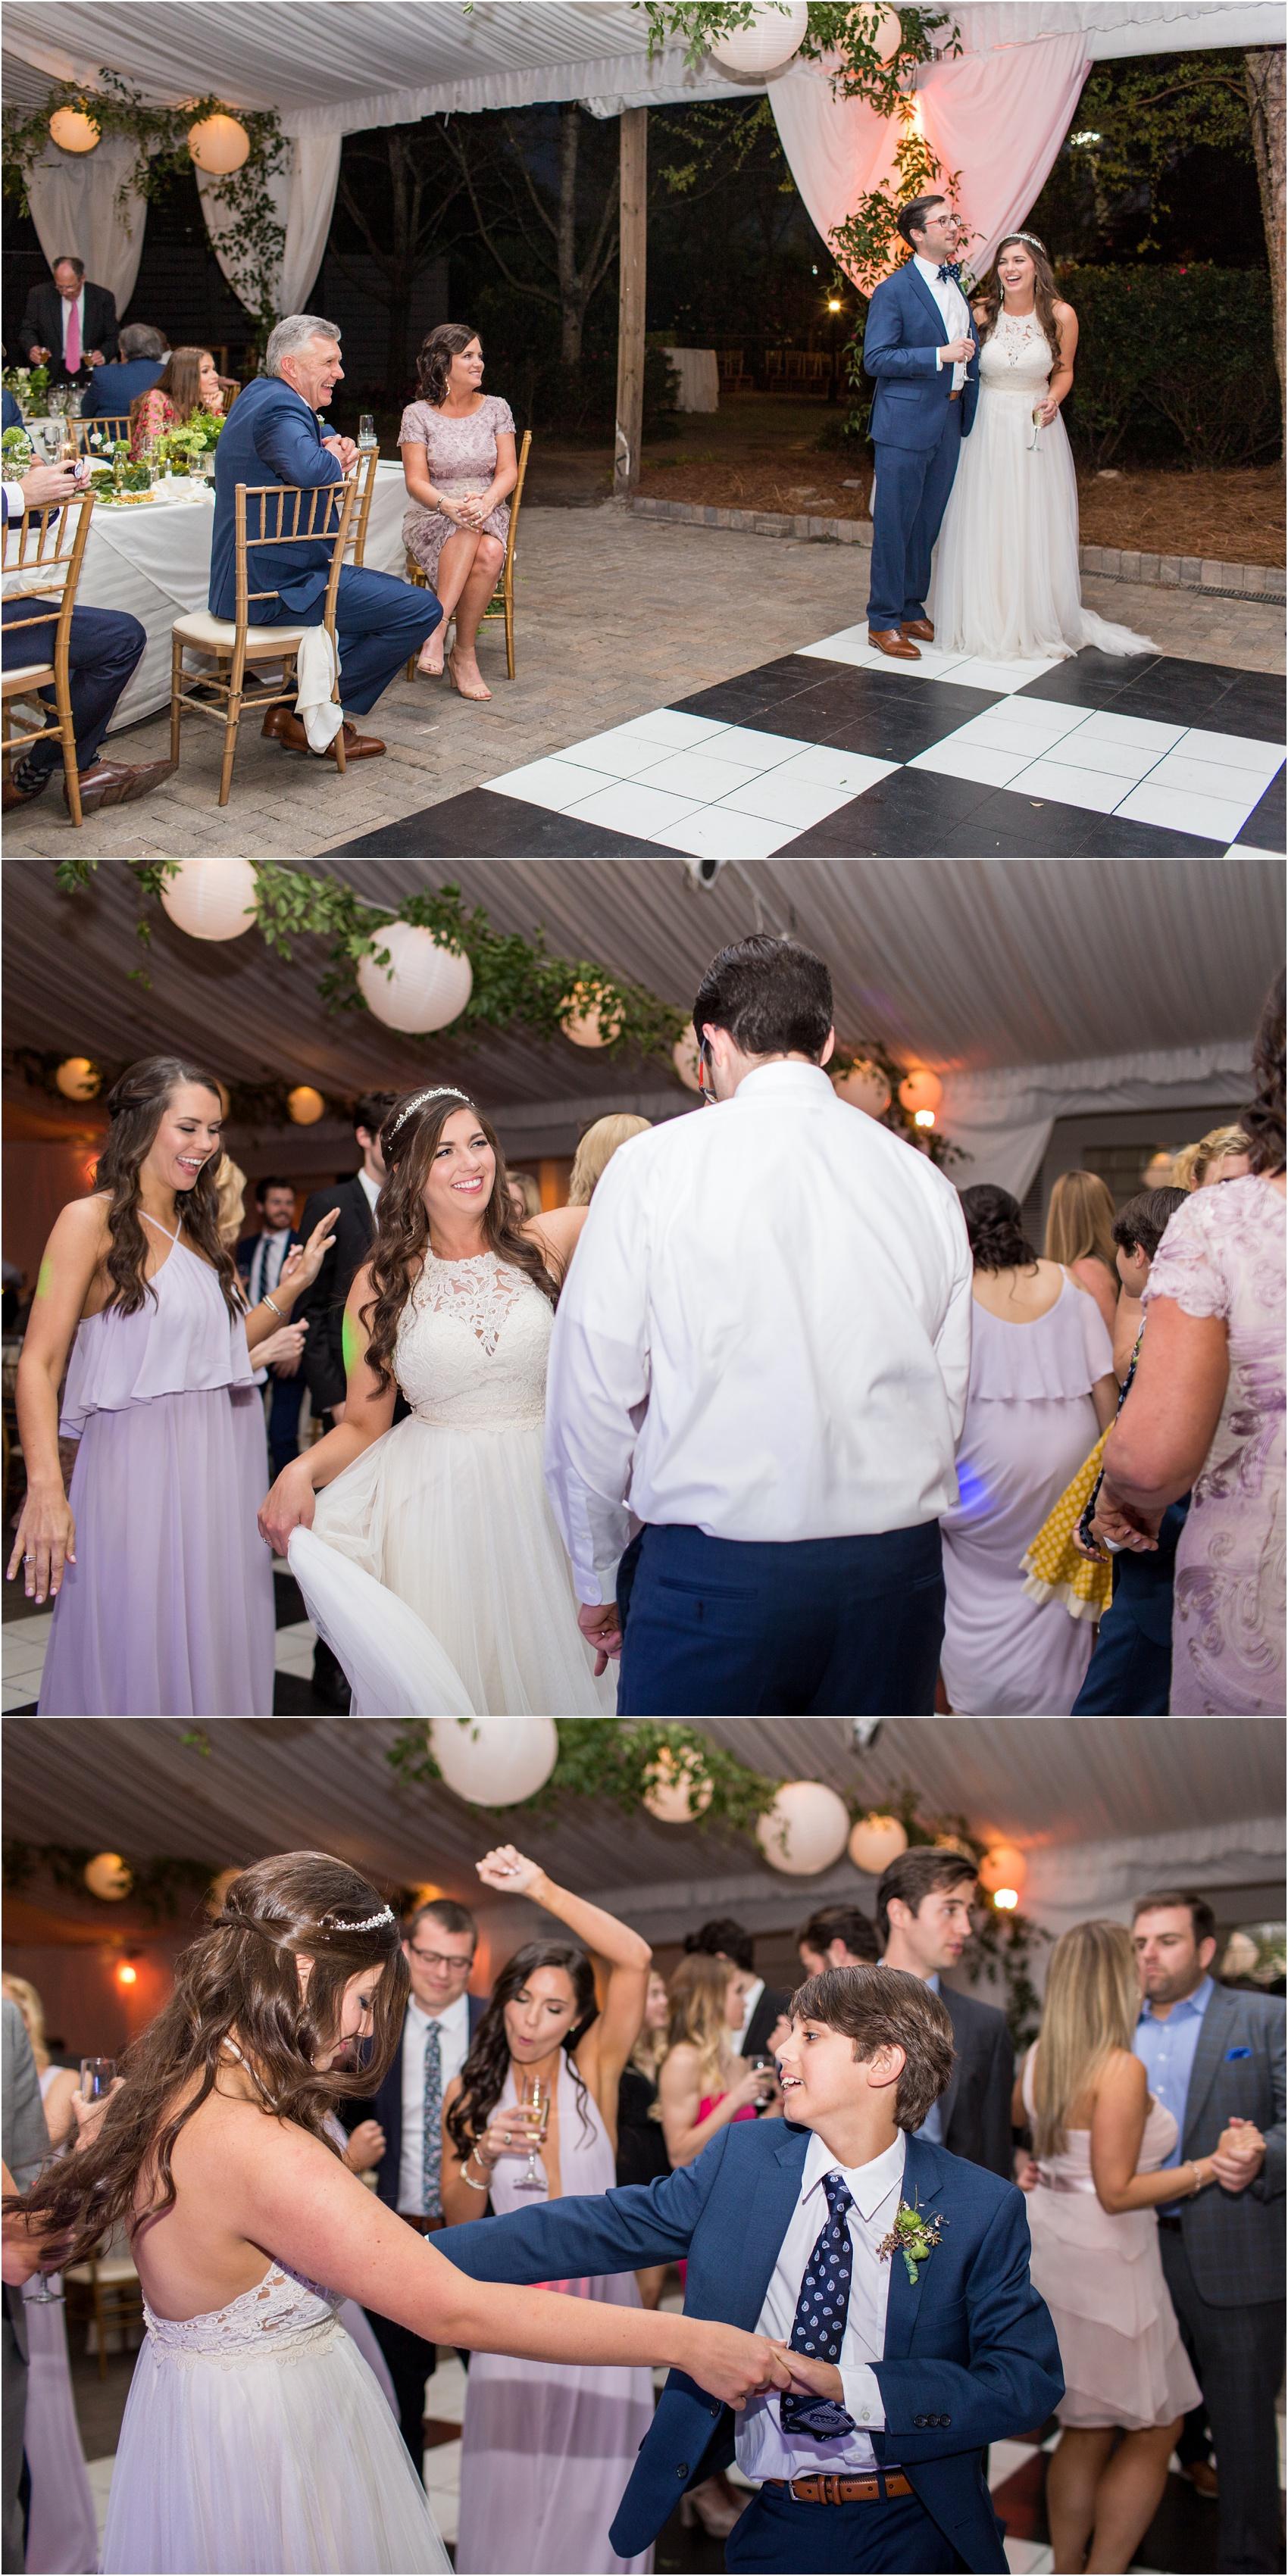 Savannah Eve Photography- Groseclose Wedding- Blog-101.jpg